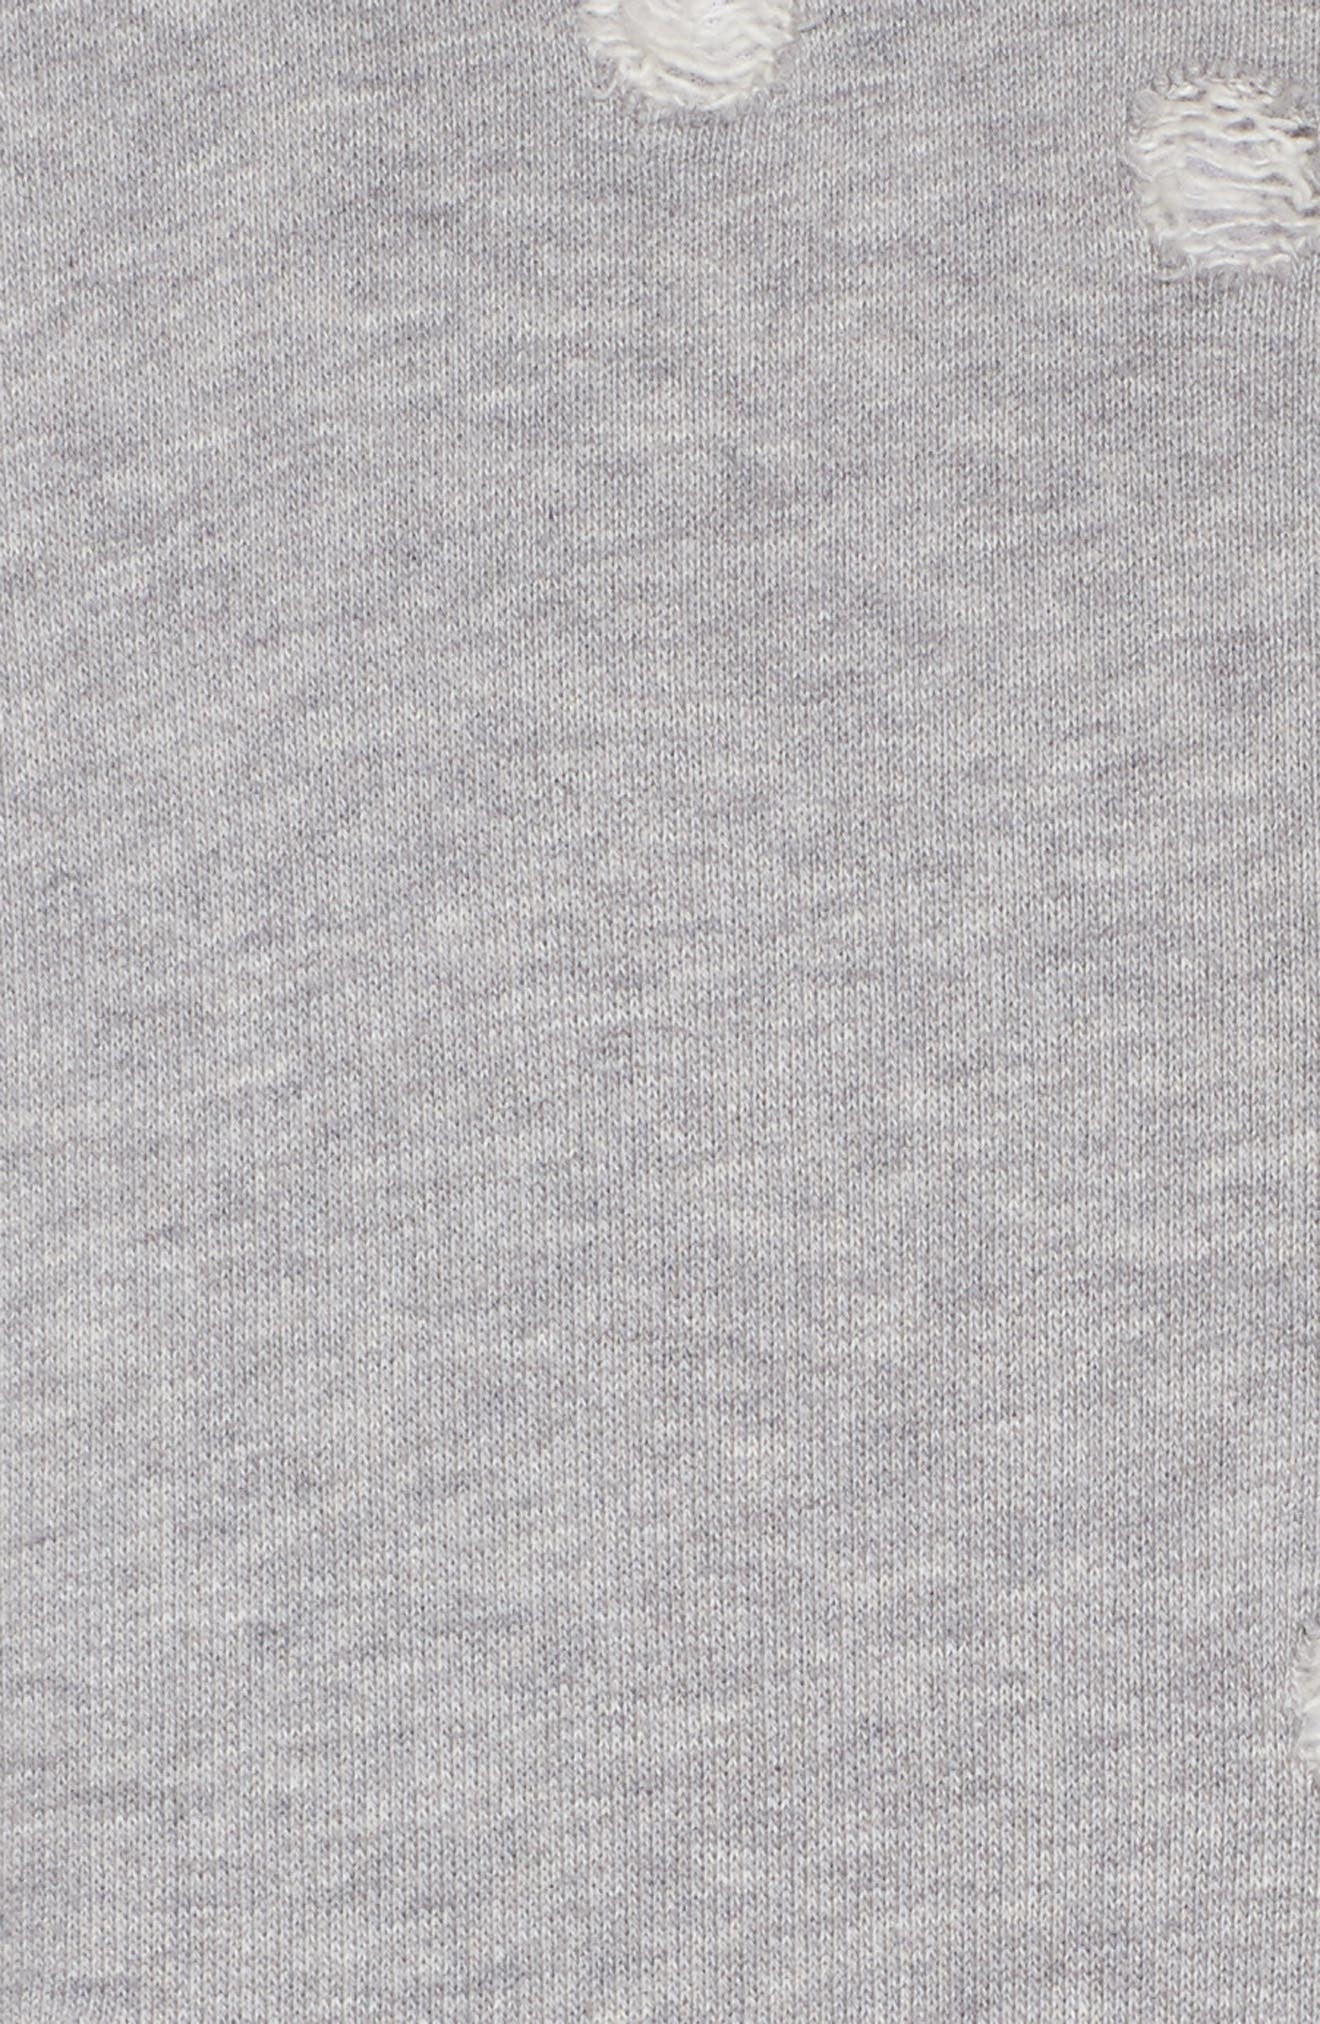 Distressed Zip Sweatshirt,                             Alternate thumbnail 5, color,                             HEATHER GREY